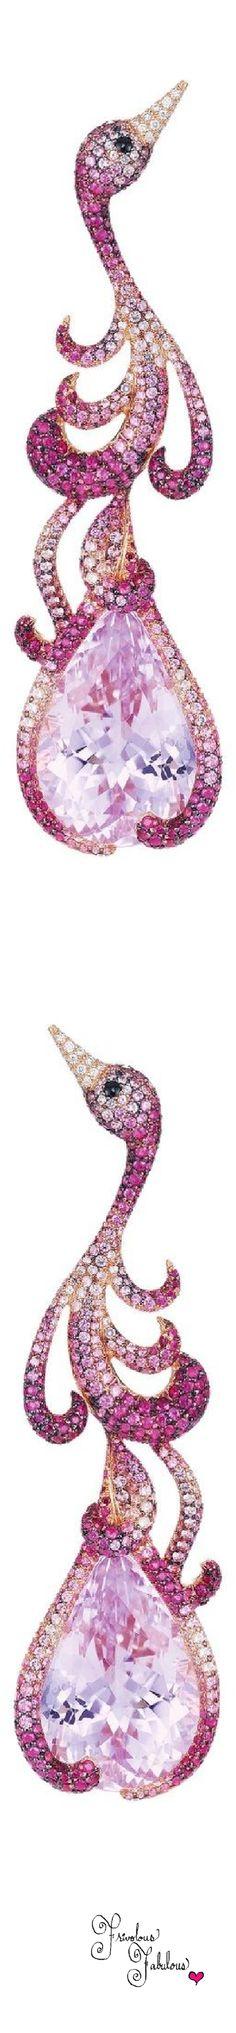 Frivolous Fabulous - Chopard Pink Sapphire Flamingo Earrings